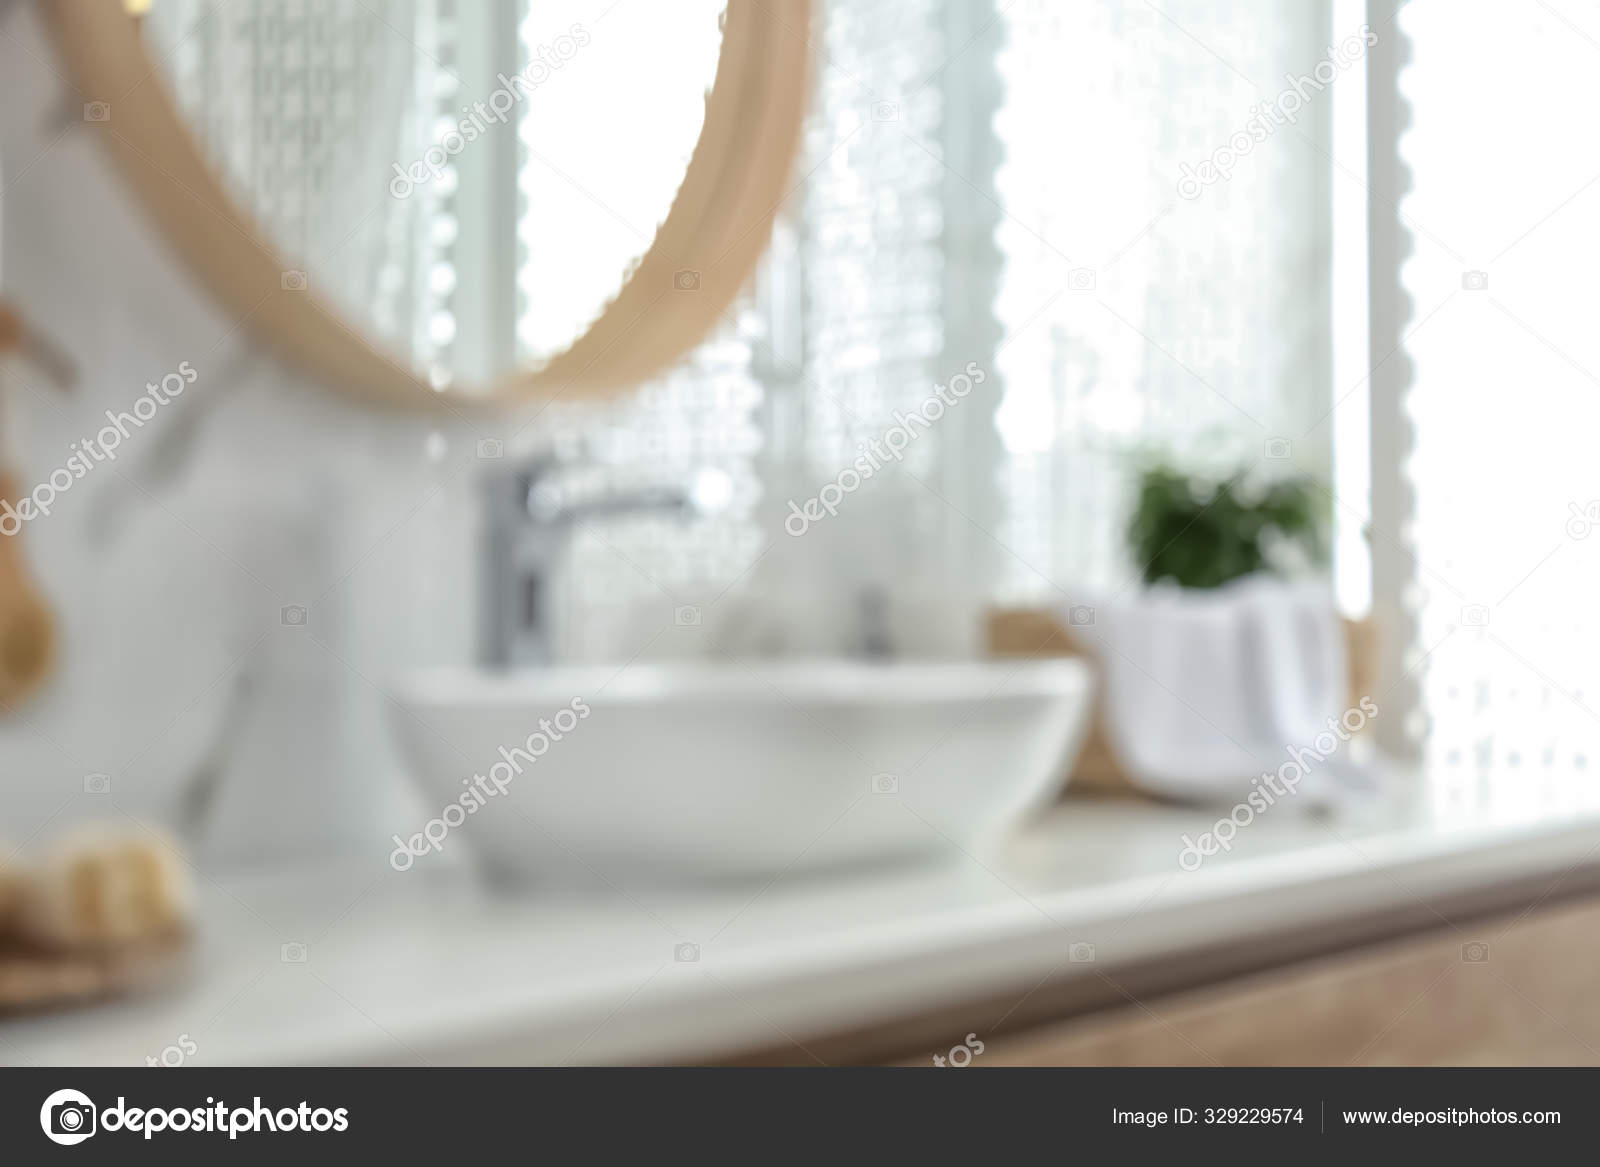 Blurred View Stylish Modern Bathroom Vessel Sink Stock Photo Image By C Newafrica 329229574